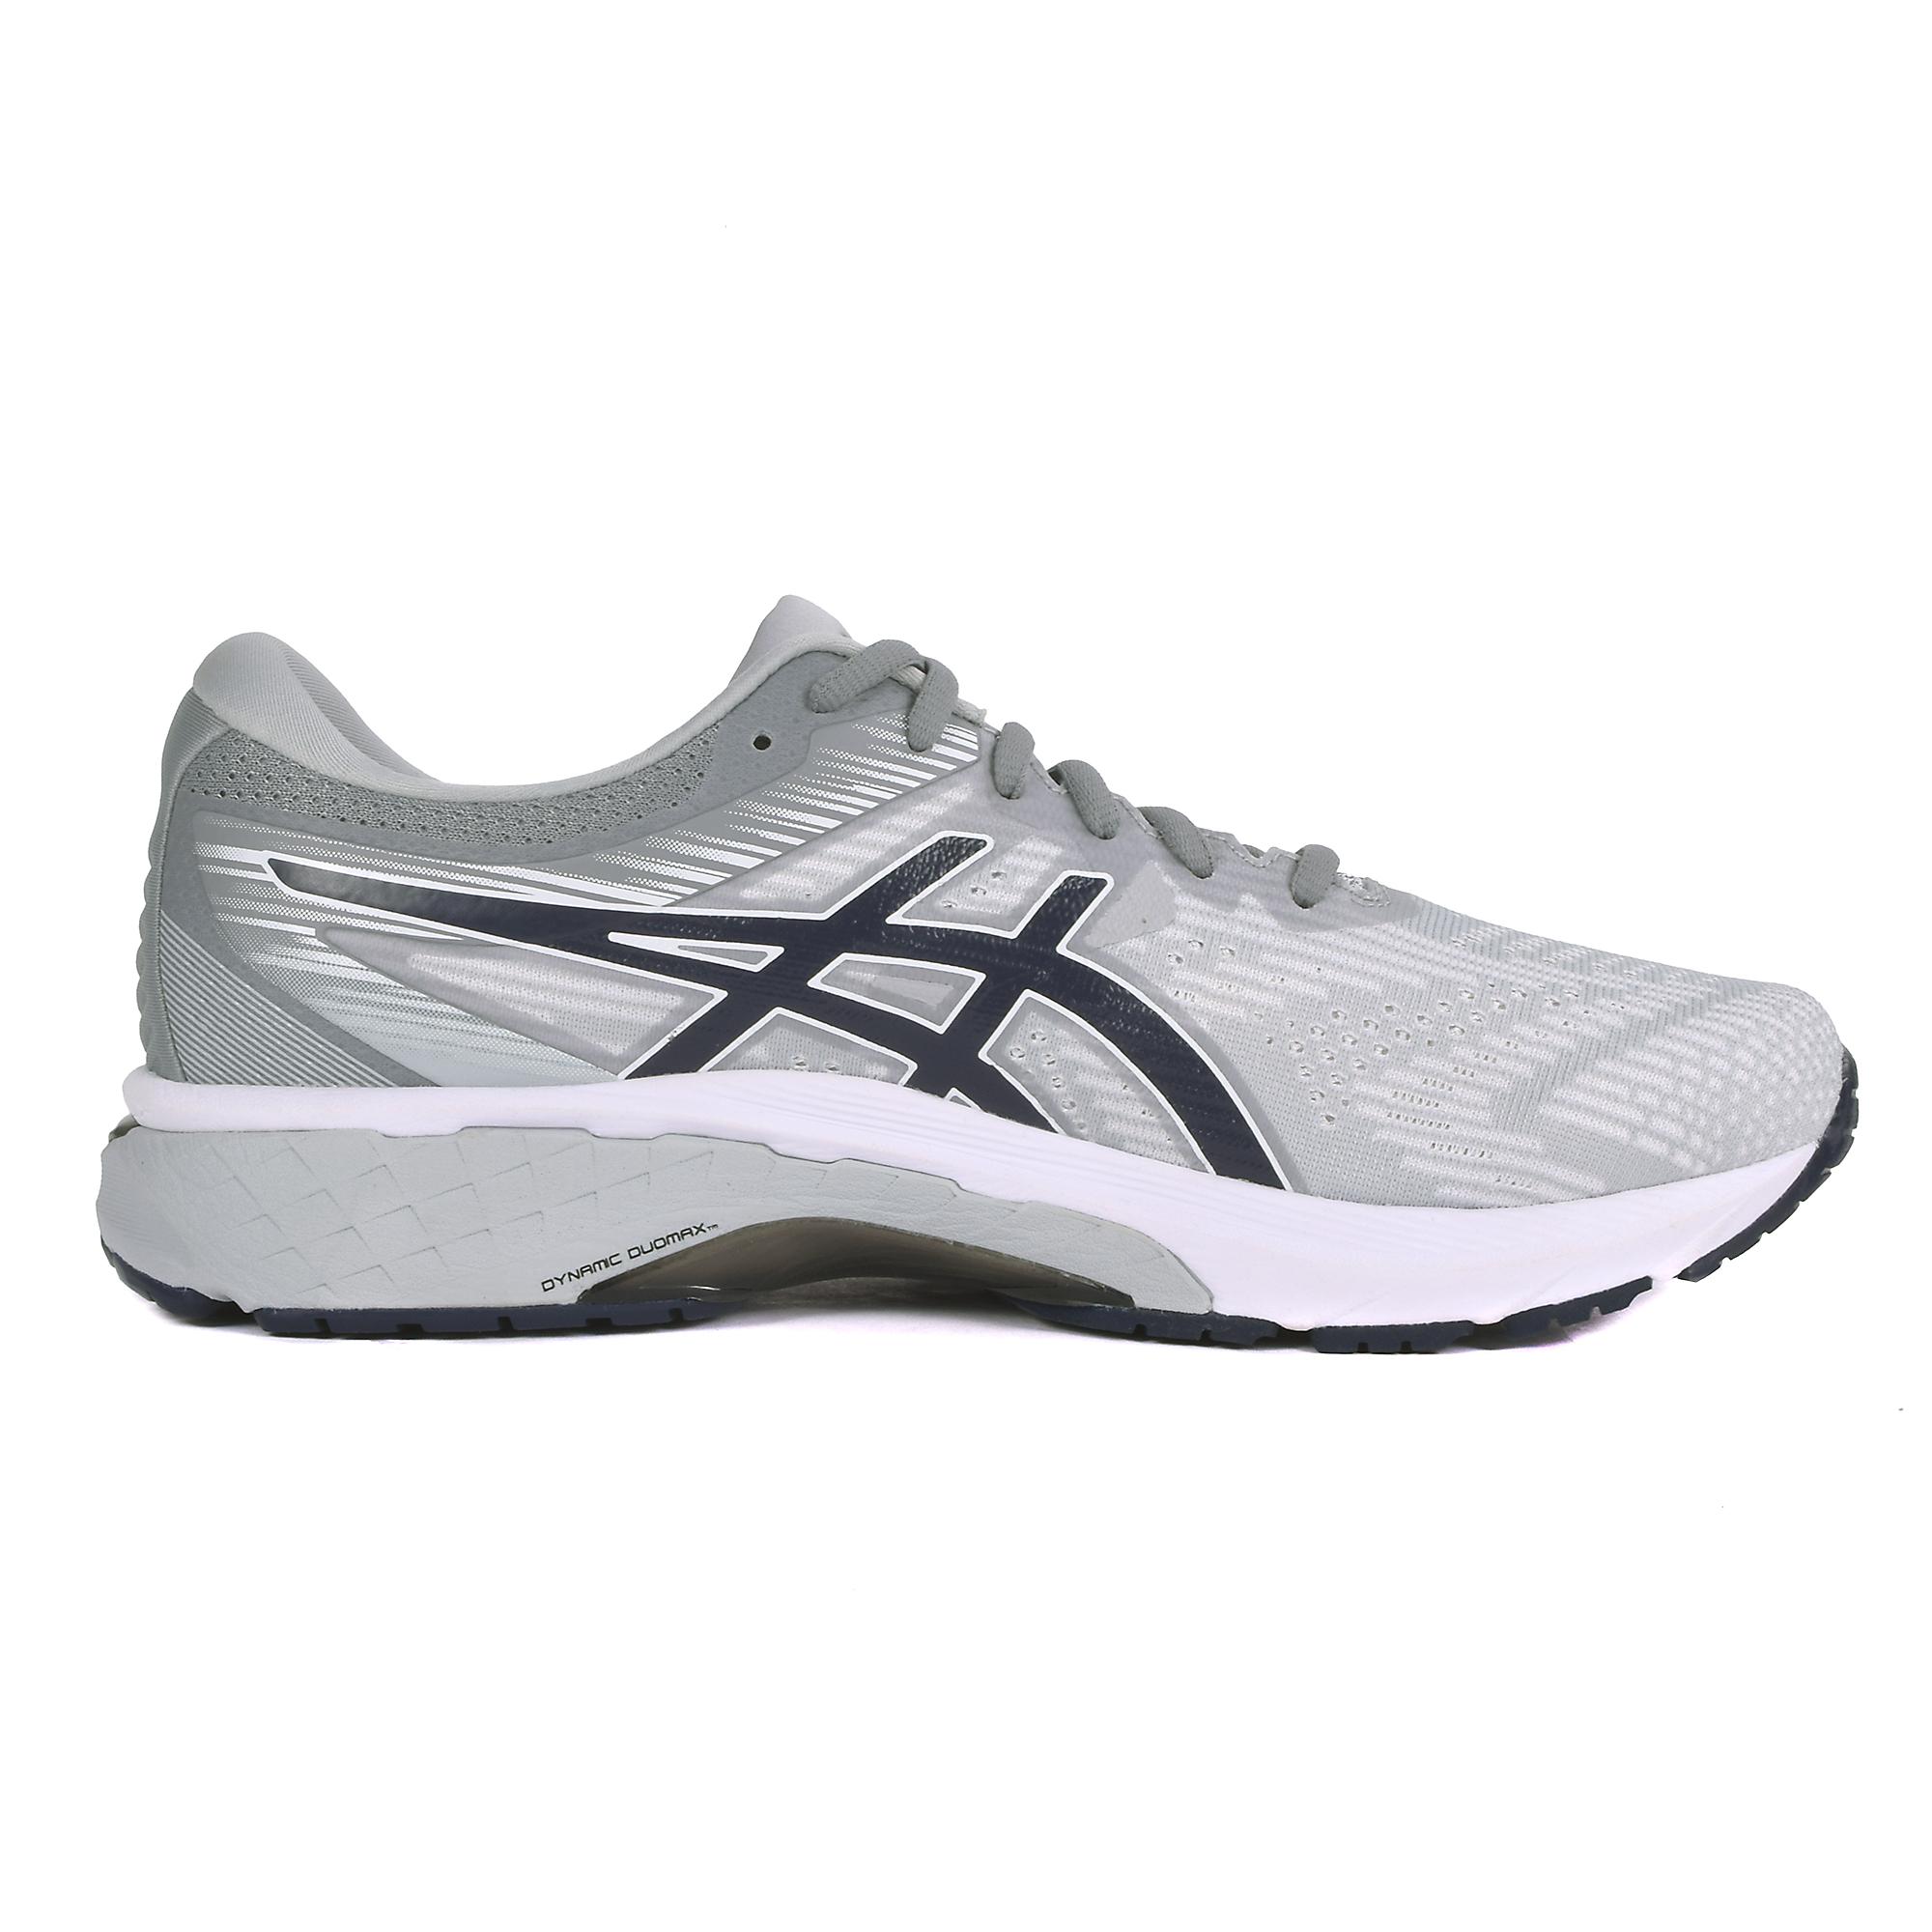 Men's Asics Gt-2000 8 Running Shoe - Color: Piedmont Grey (Regular Width) - Size: 7, Grey, large, image 3